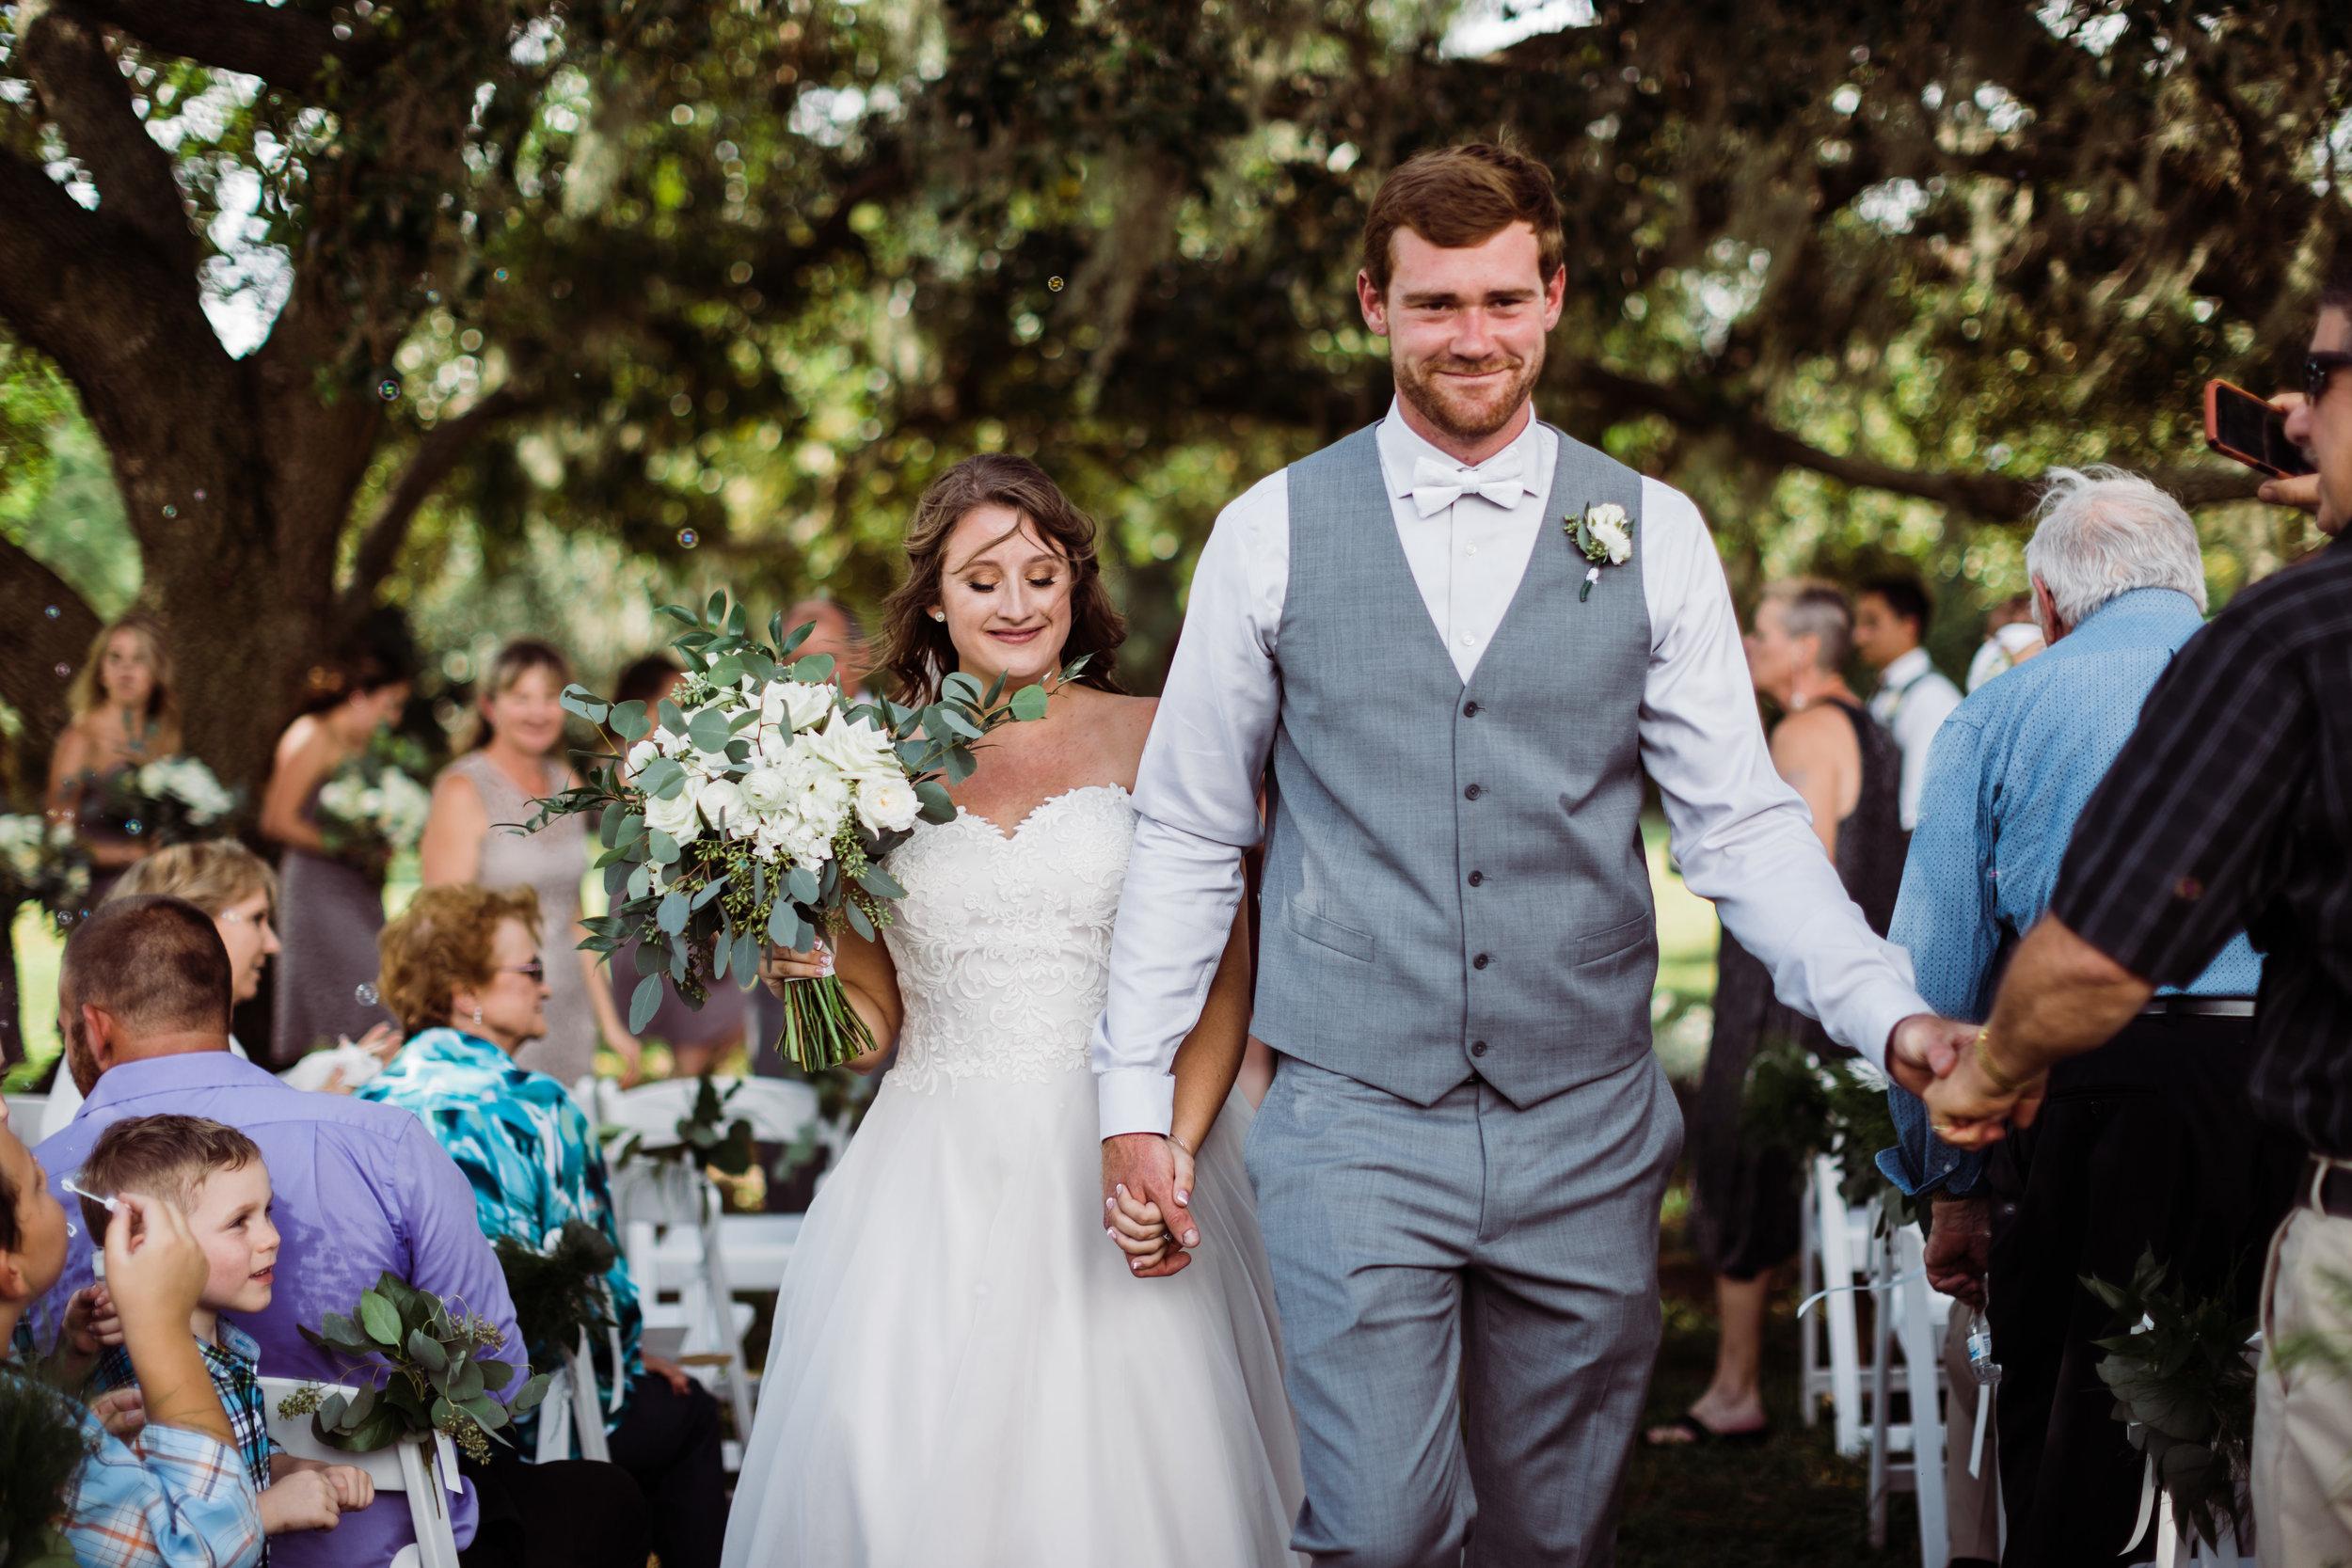 2017.10.14 Samantha and Matthew Crabtree Sarasota Wedding (191 of 708).jpg